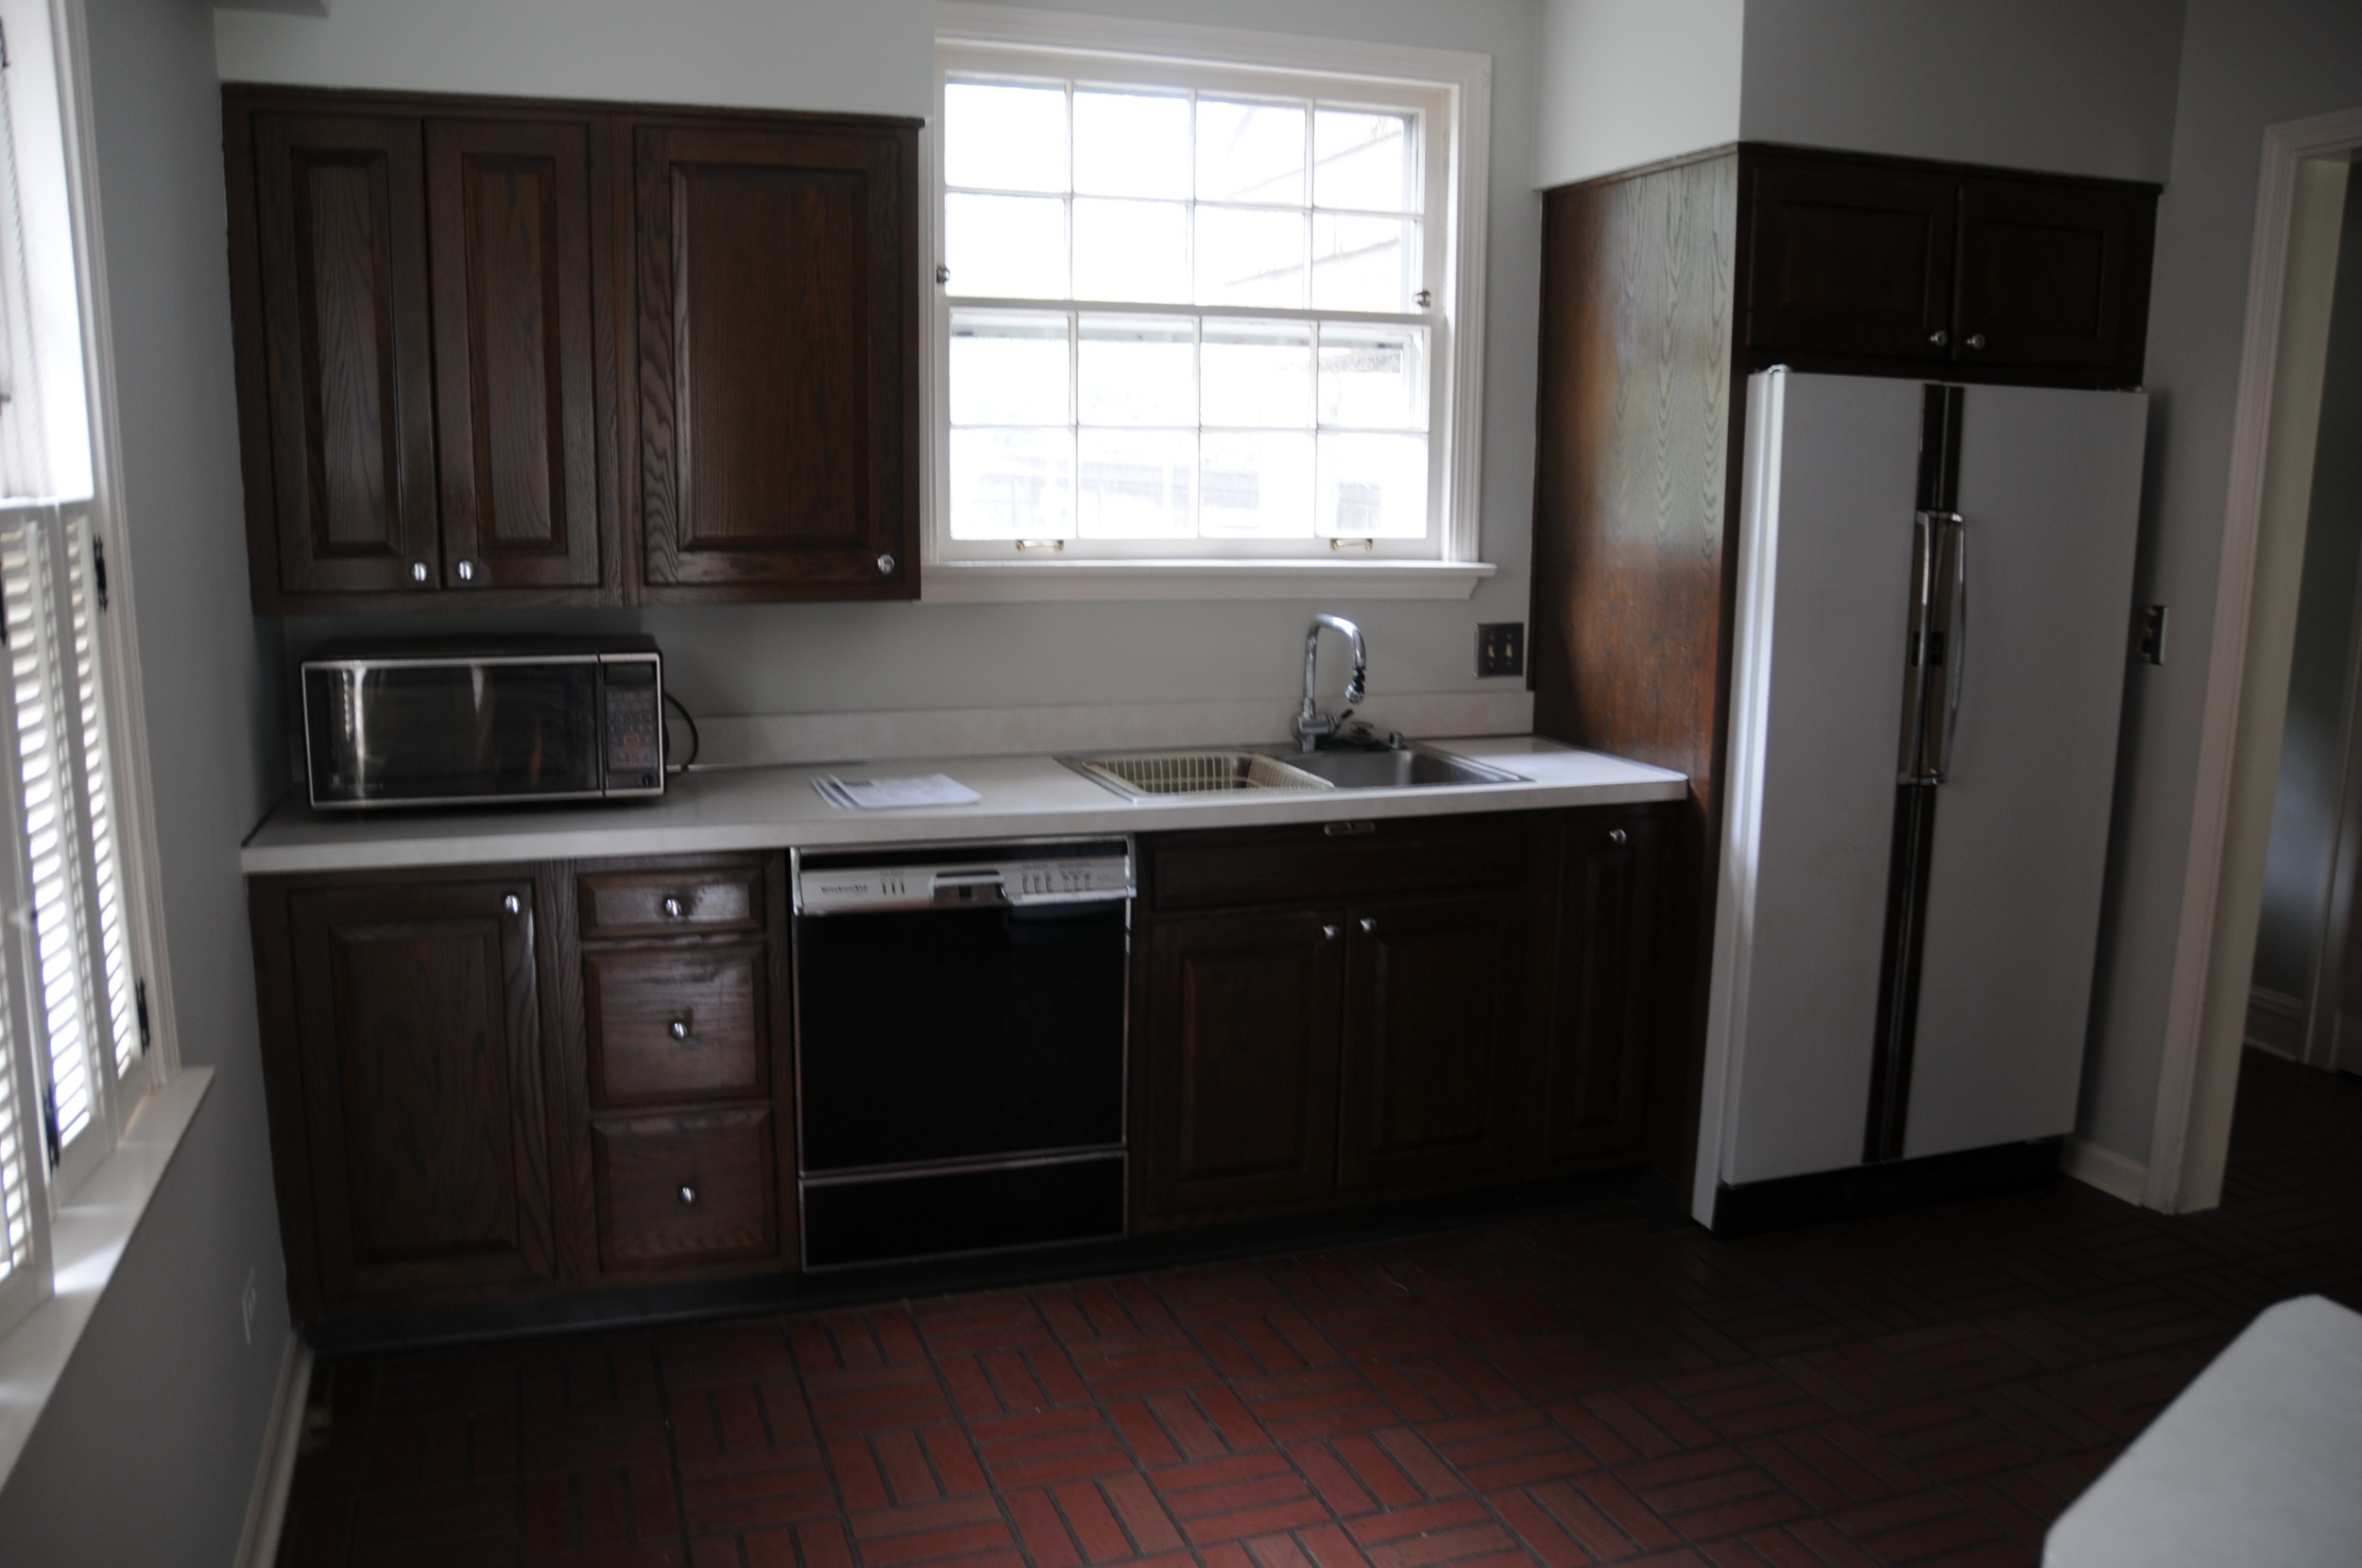 Half the original kitchen.Old, dark, and tiny.